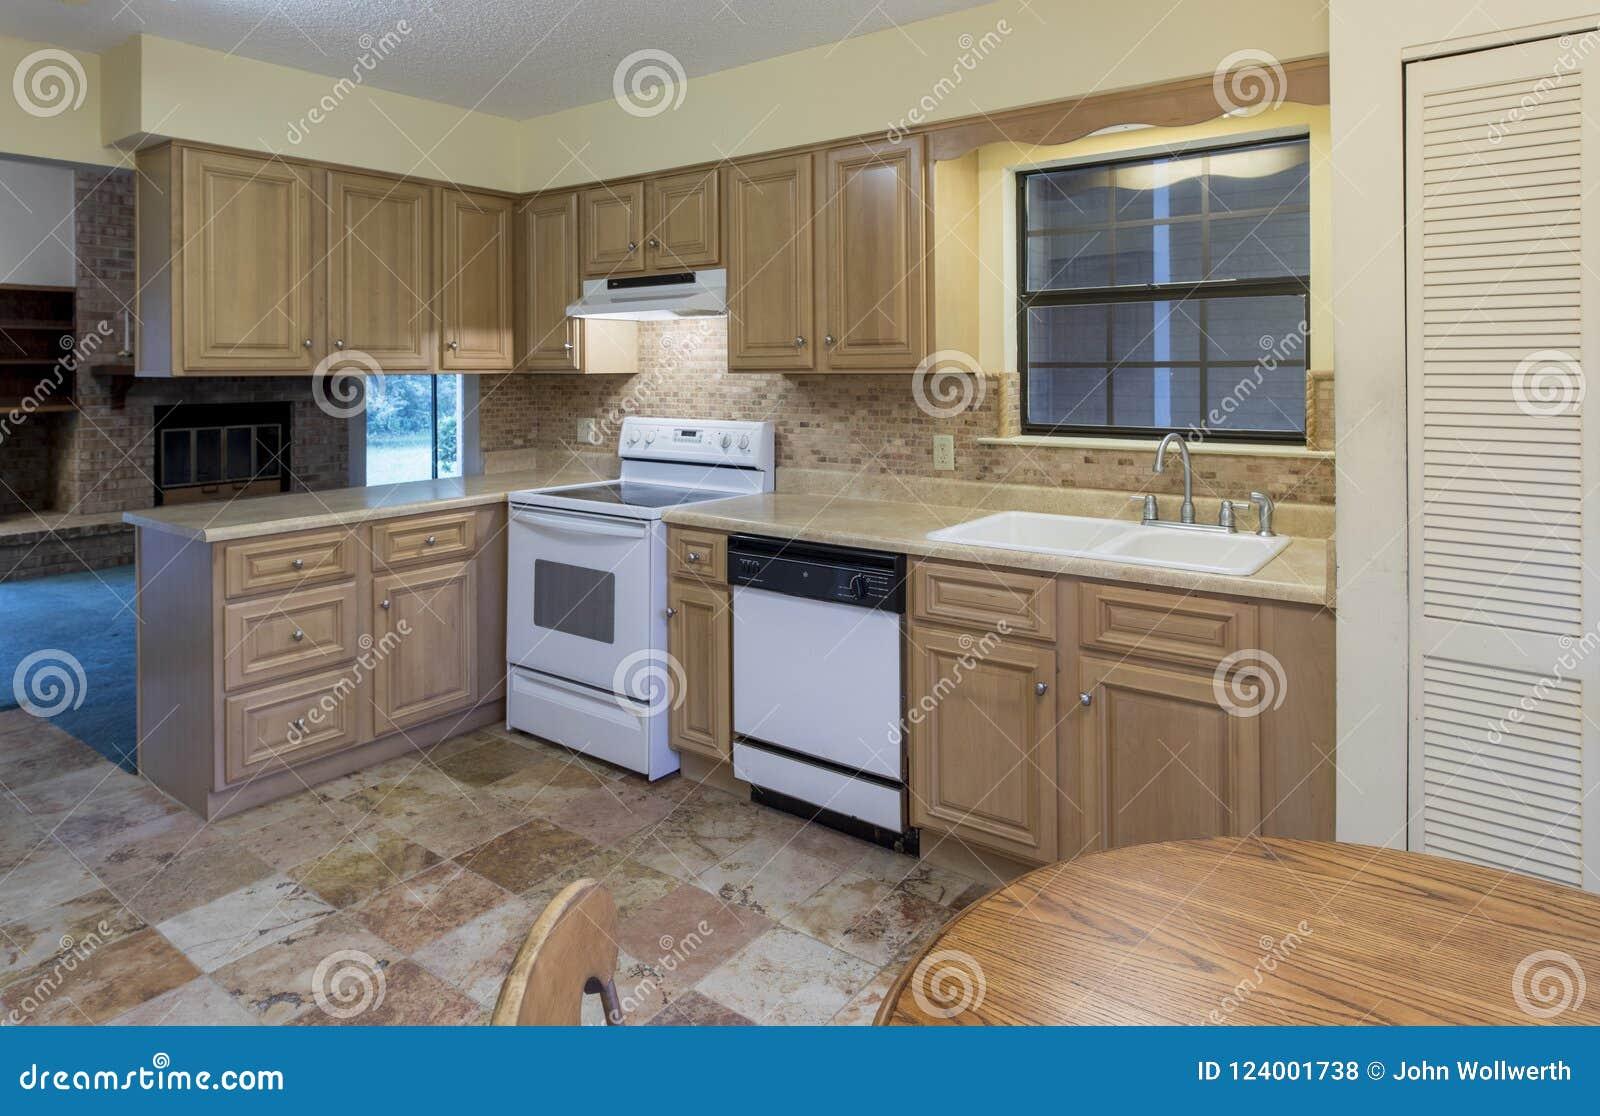 Cucina americana semplice fotografia stock. Immagine di ...